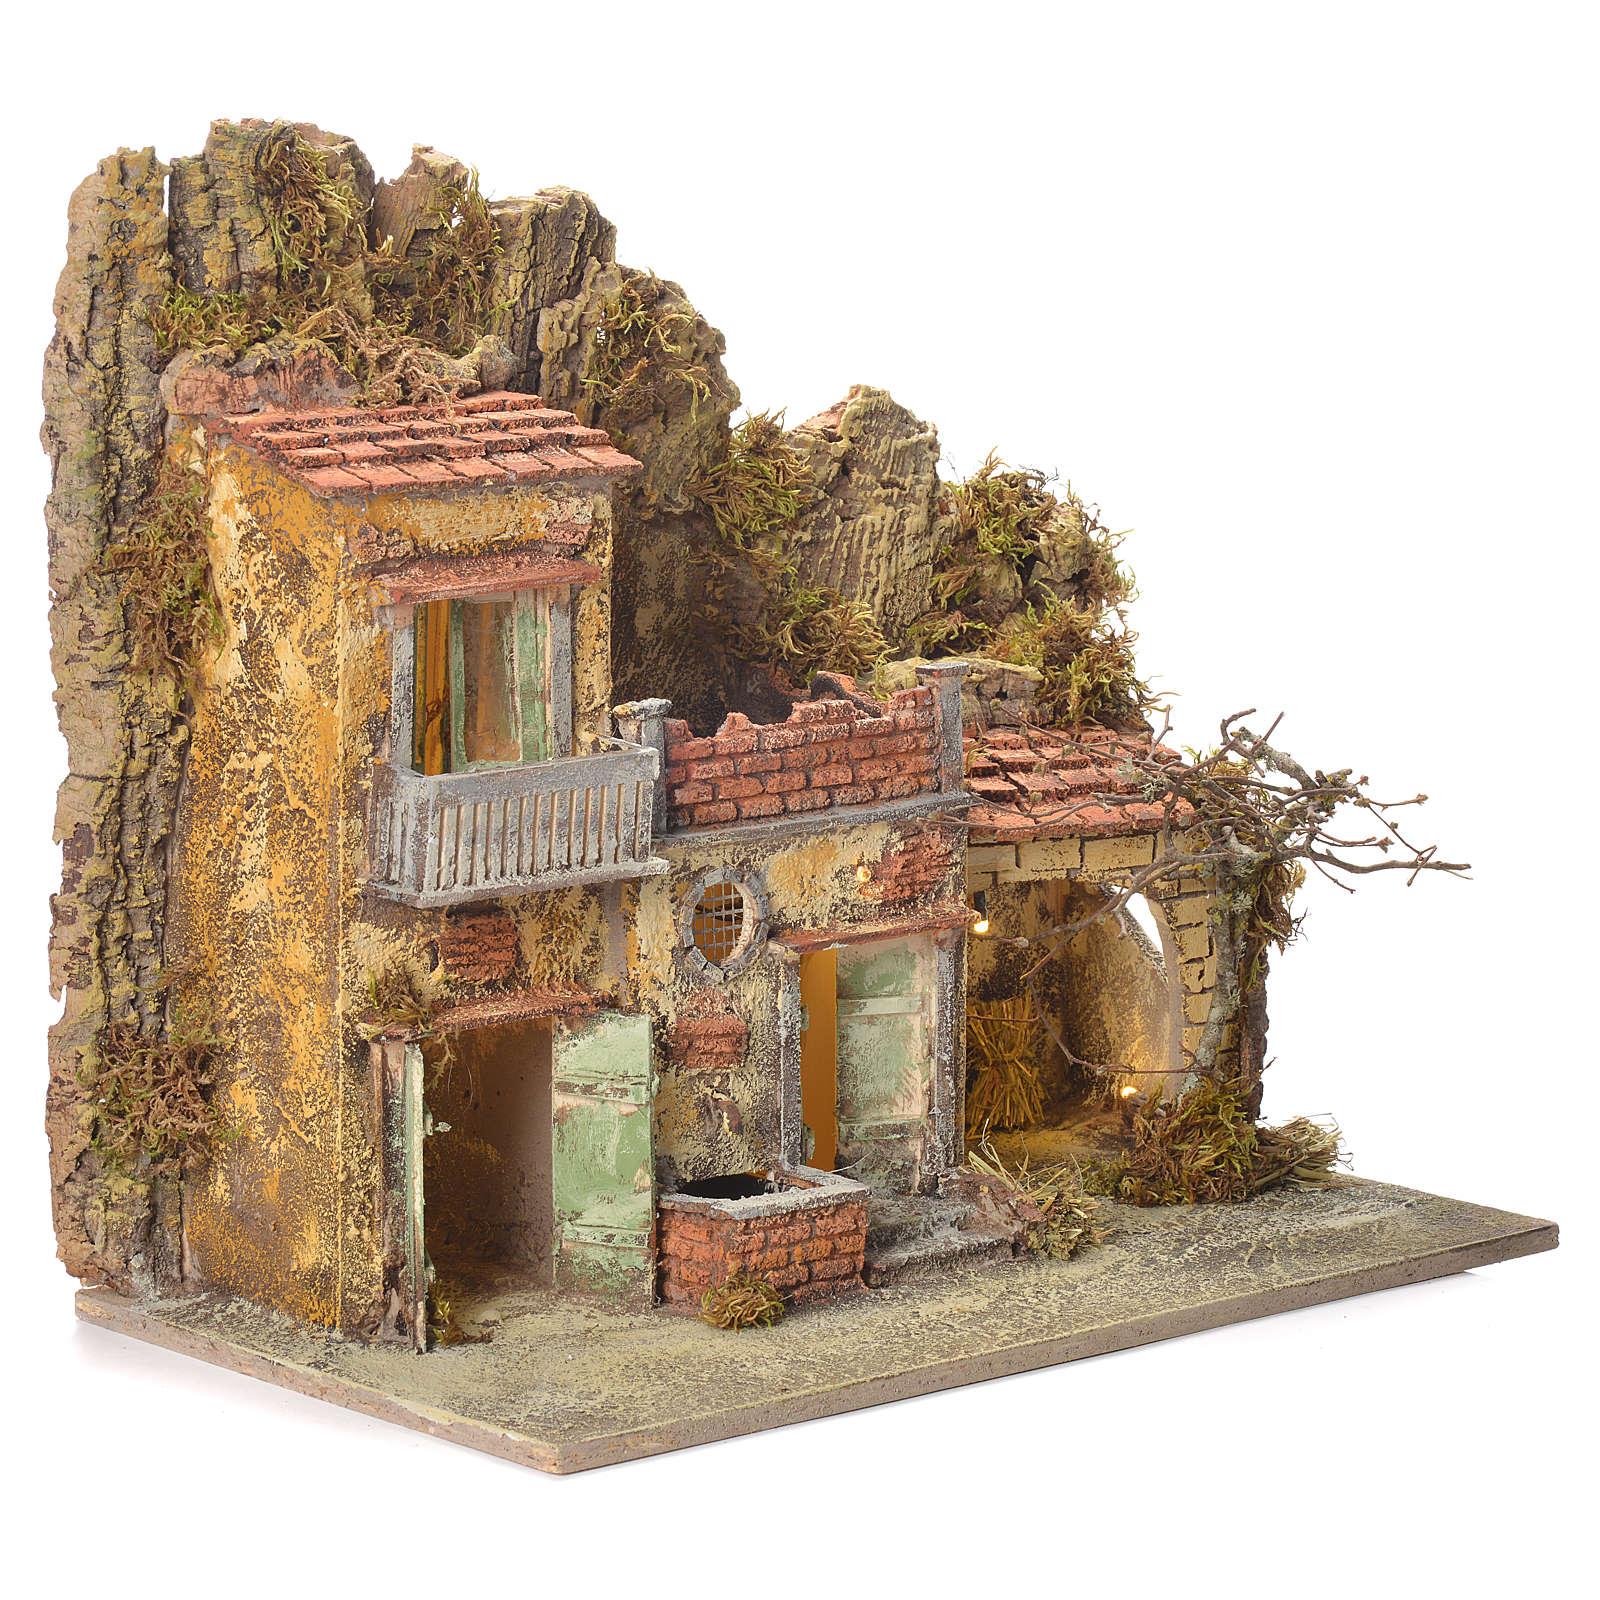 Neapolitan Nativity village with fountain measuring 45x50x30cm 4